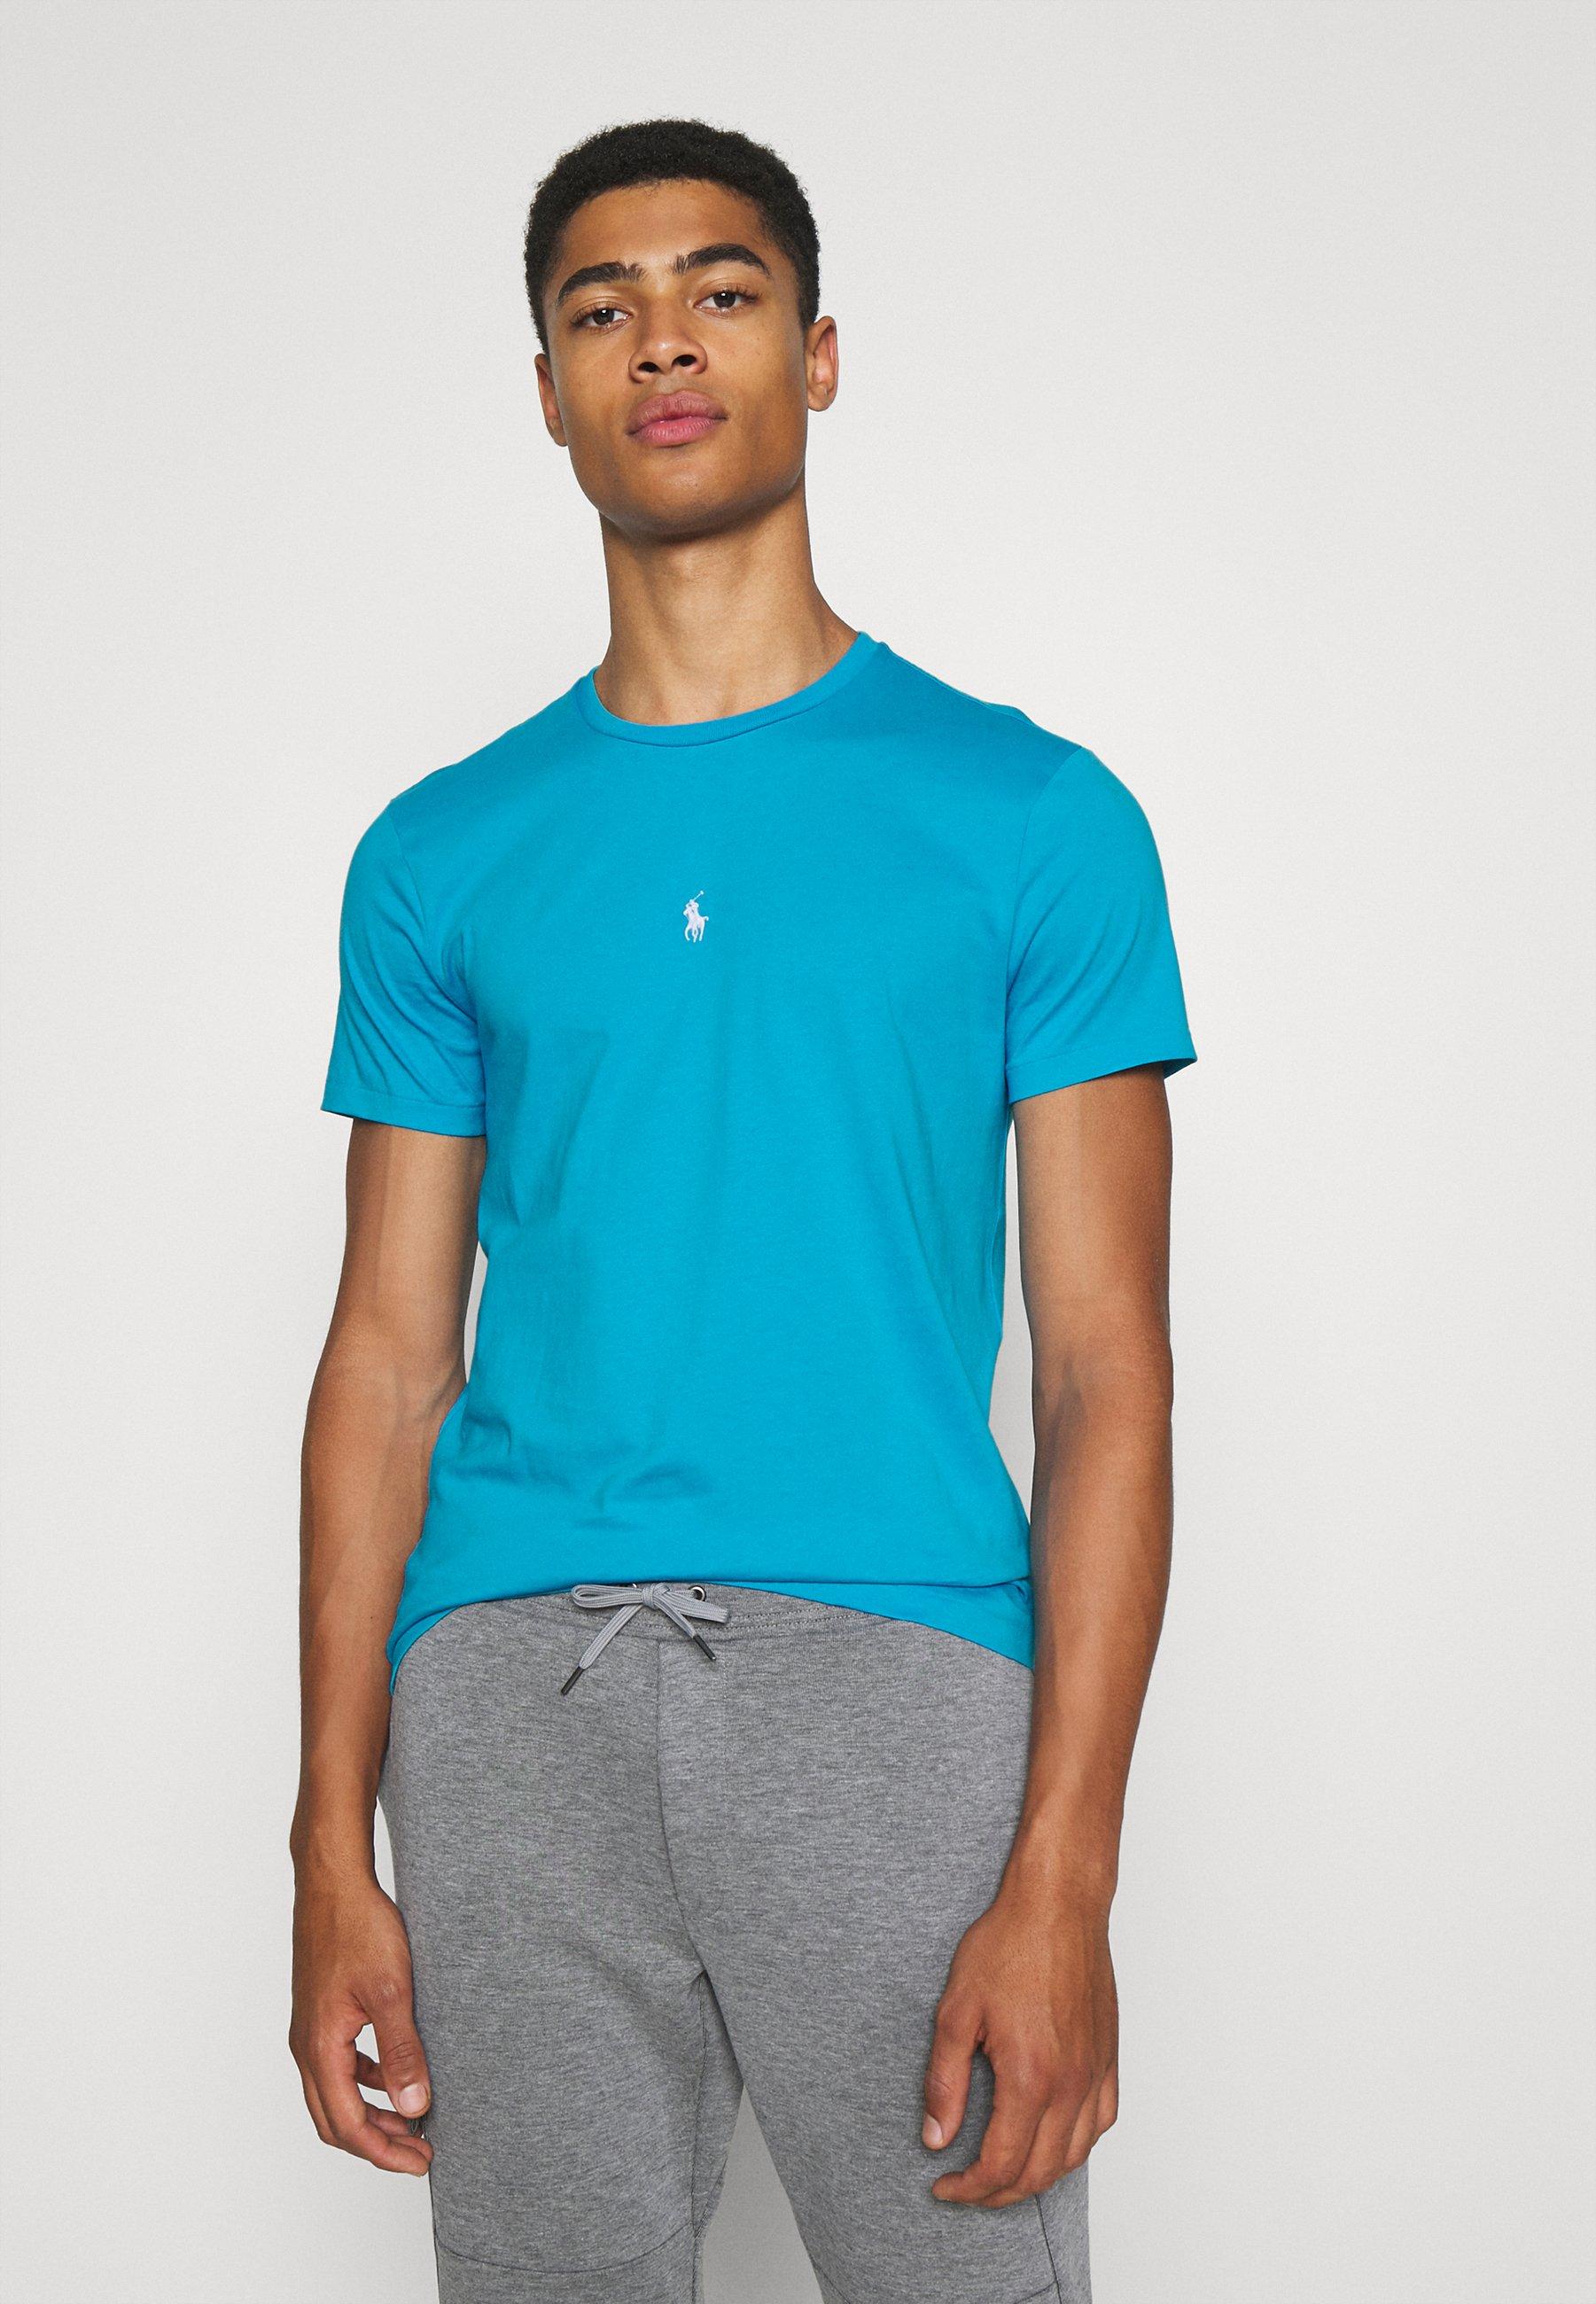 Homme CUSTOM SLIM FIT JERSEY T-SHIRT - T-shirt basique